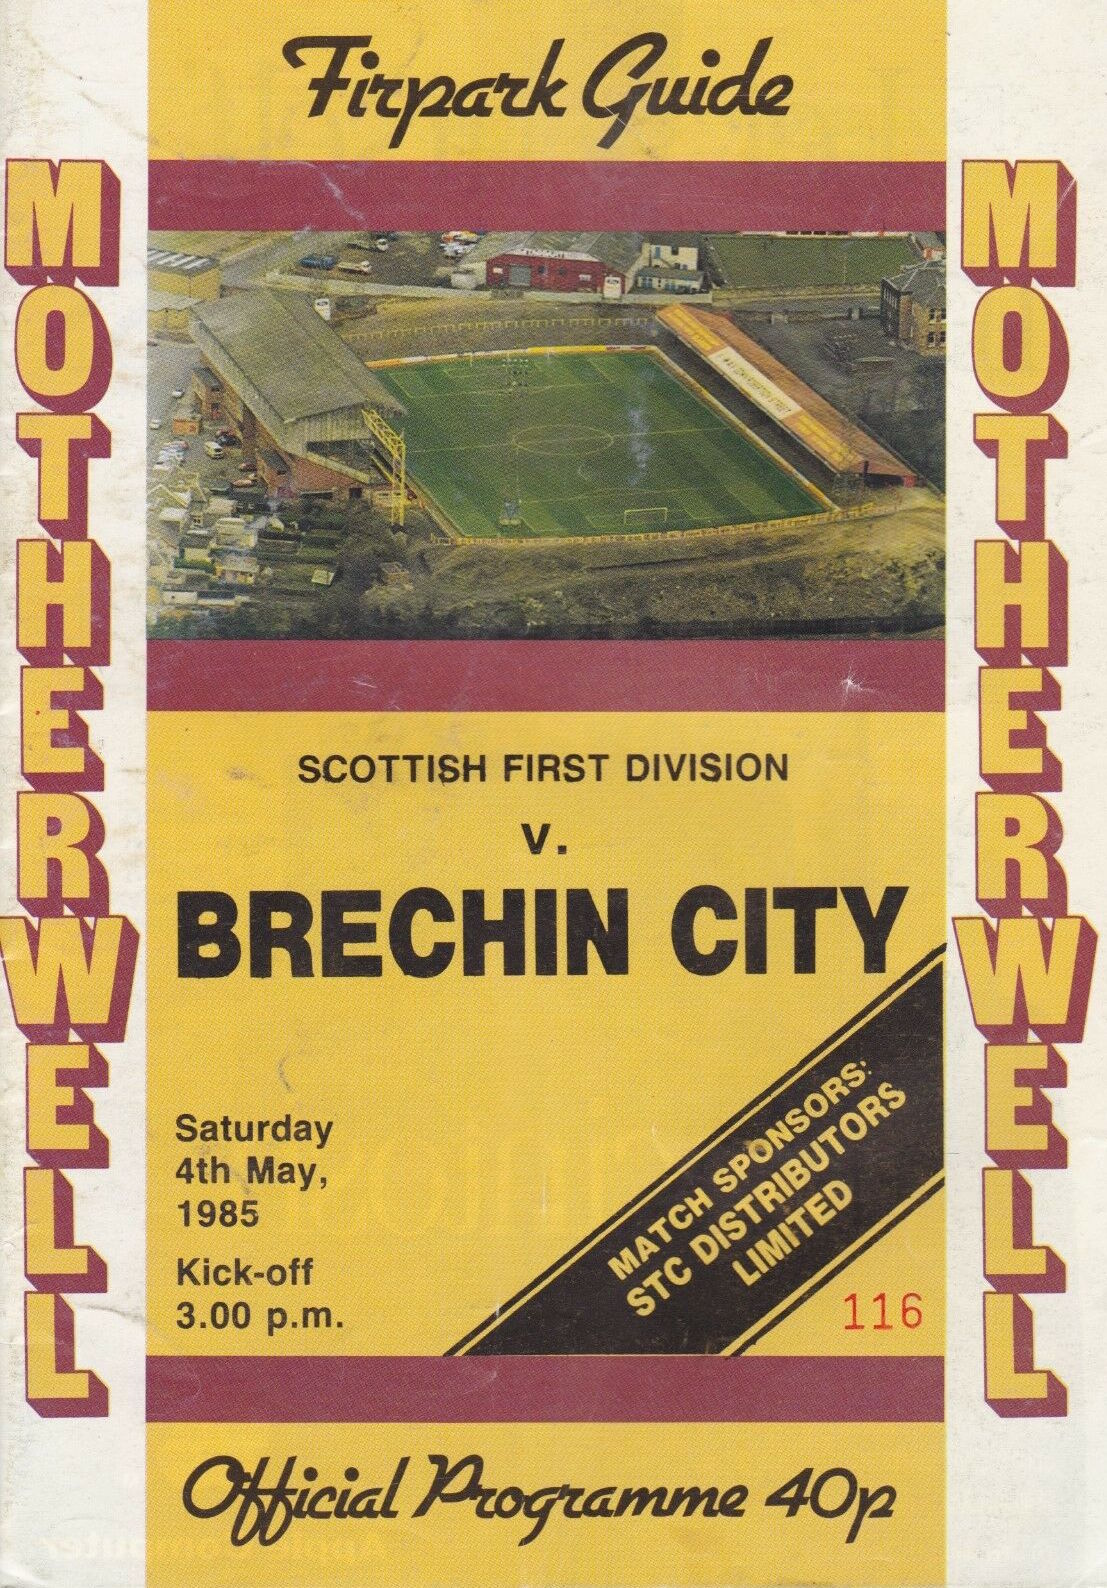 versus Brechin City Programme Cover